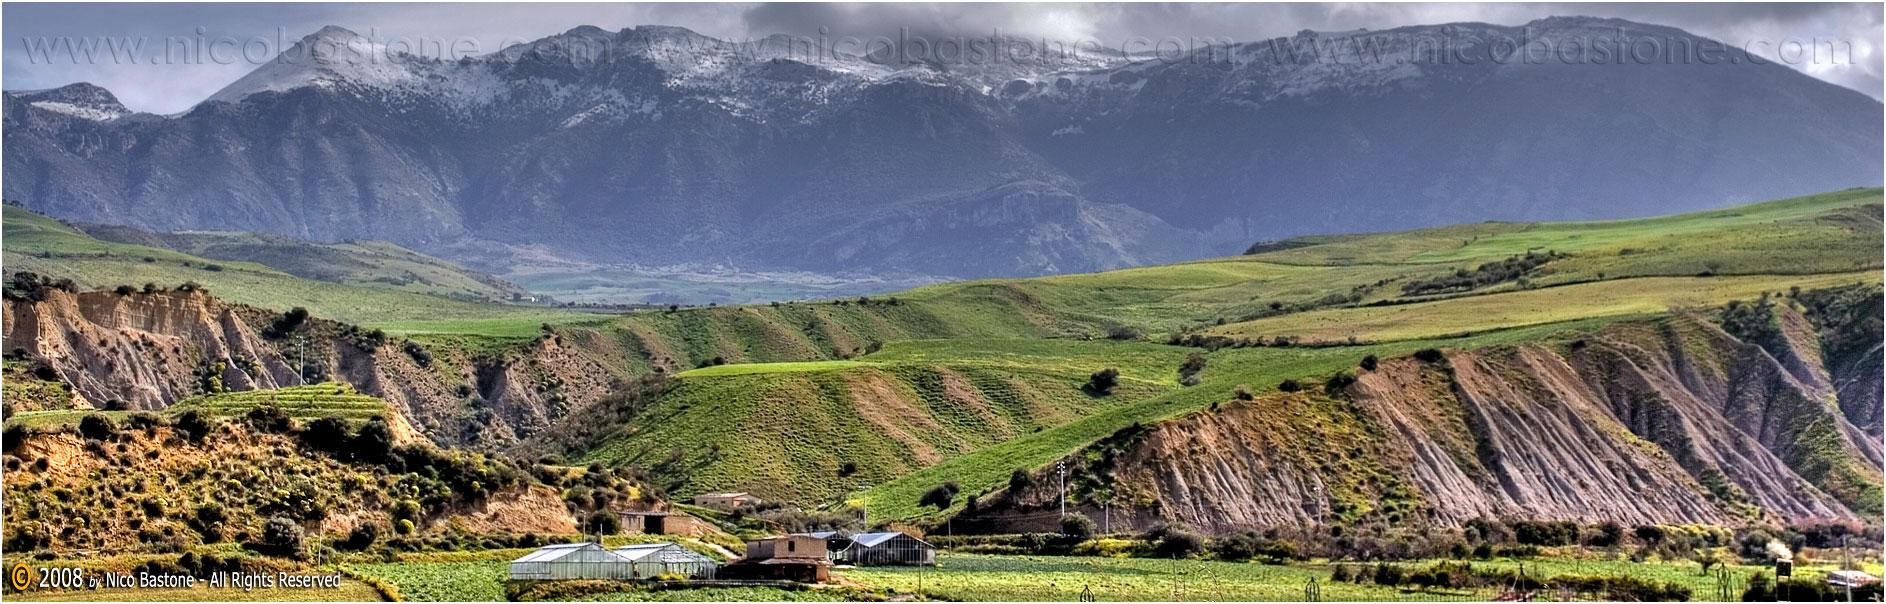 ... Landscape in a winter day - HDR High Dynamic Range Foto, photos, fotos: www.nicobastone.com/GR000.htm